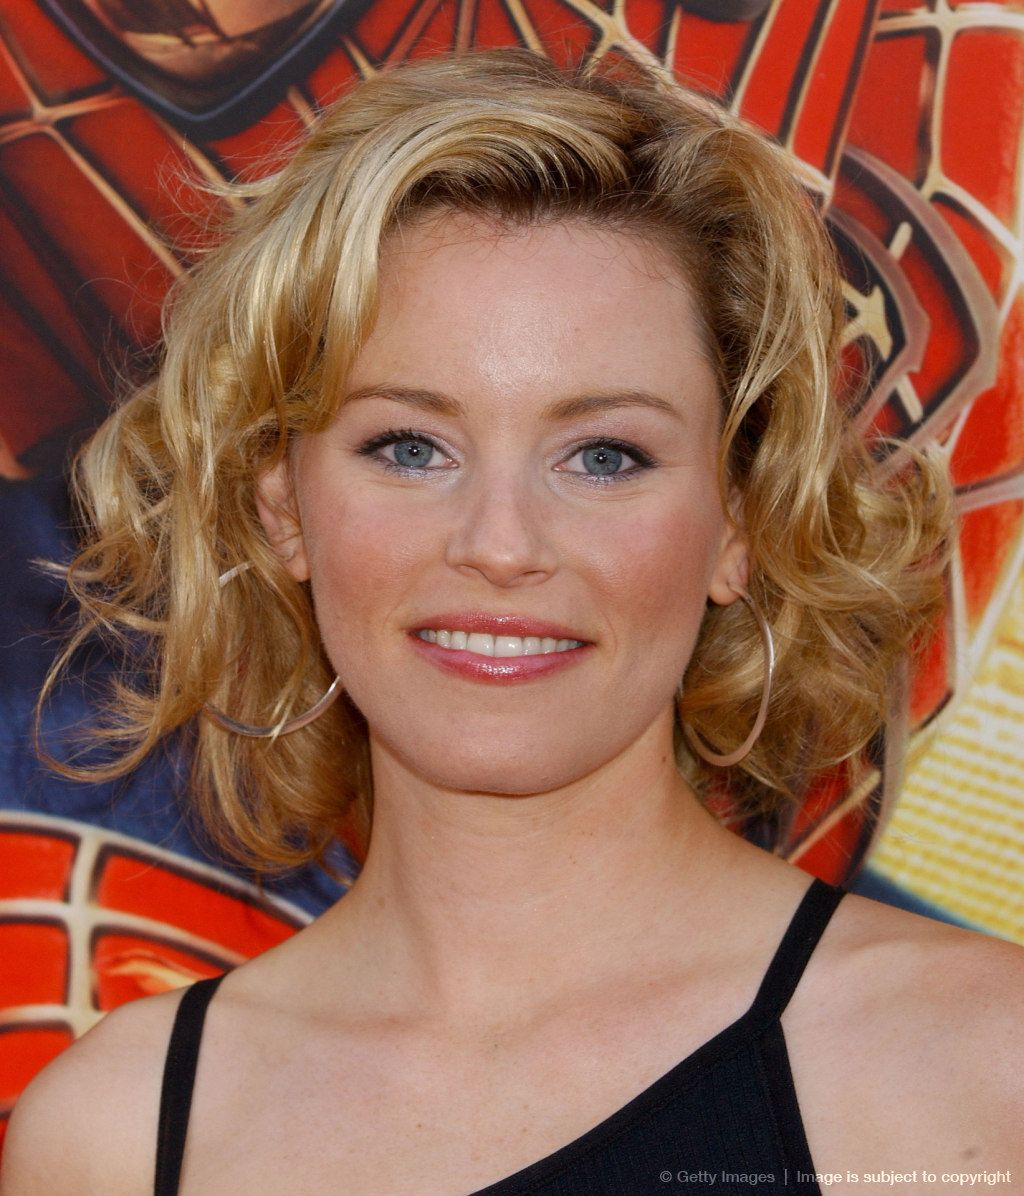 Spider Man 2 Los Angeles Premiere Arrivals Elizabeth Banks Celebrity Hairstyles Celebs